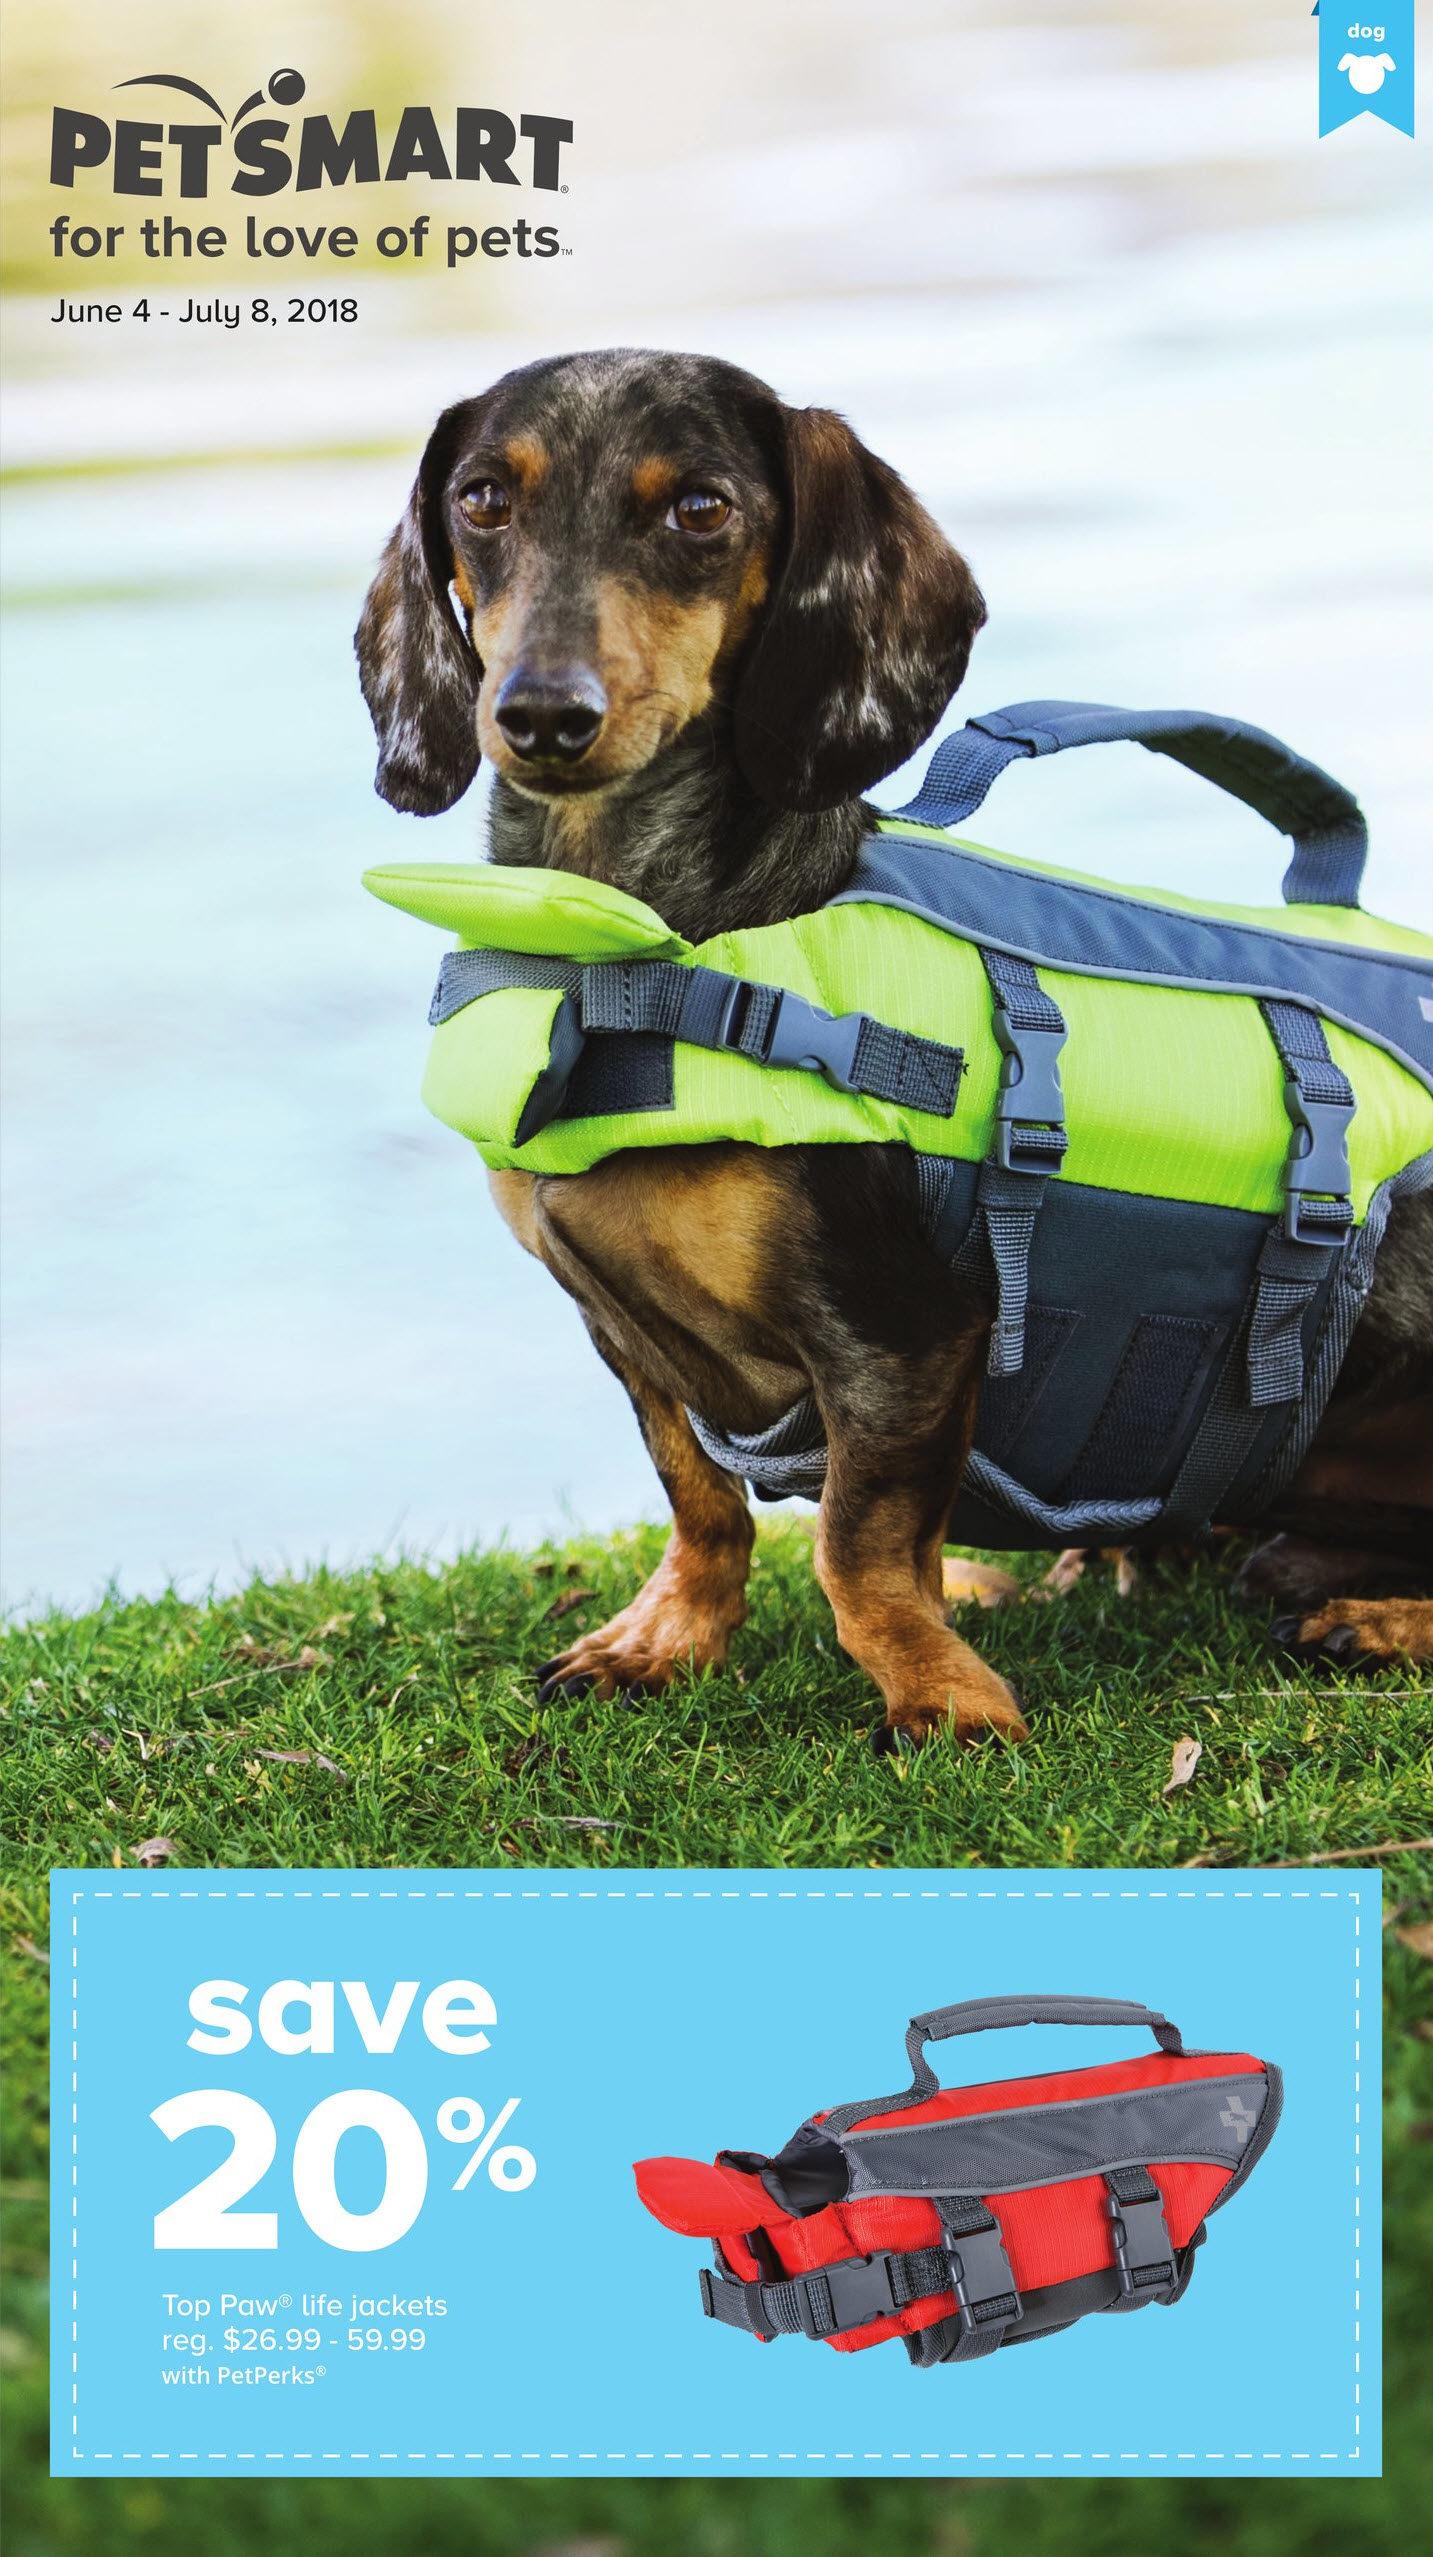 Petsmart Weekly Flyer For The Love Of Pets Jun 4 Jul 8 Redflagdeals Com